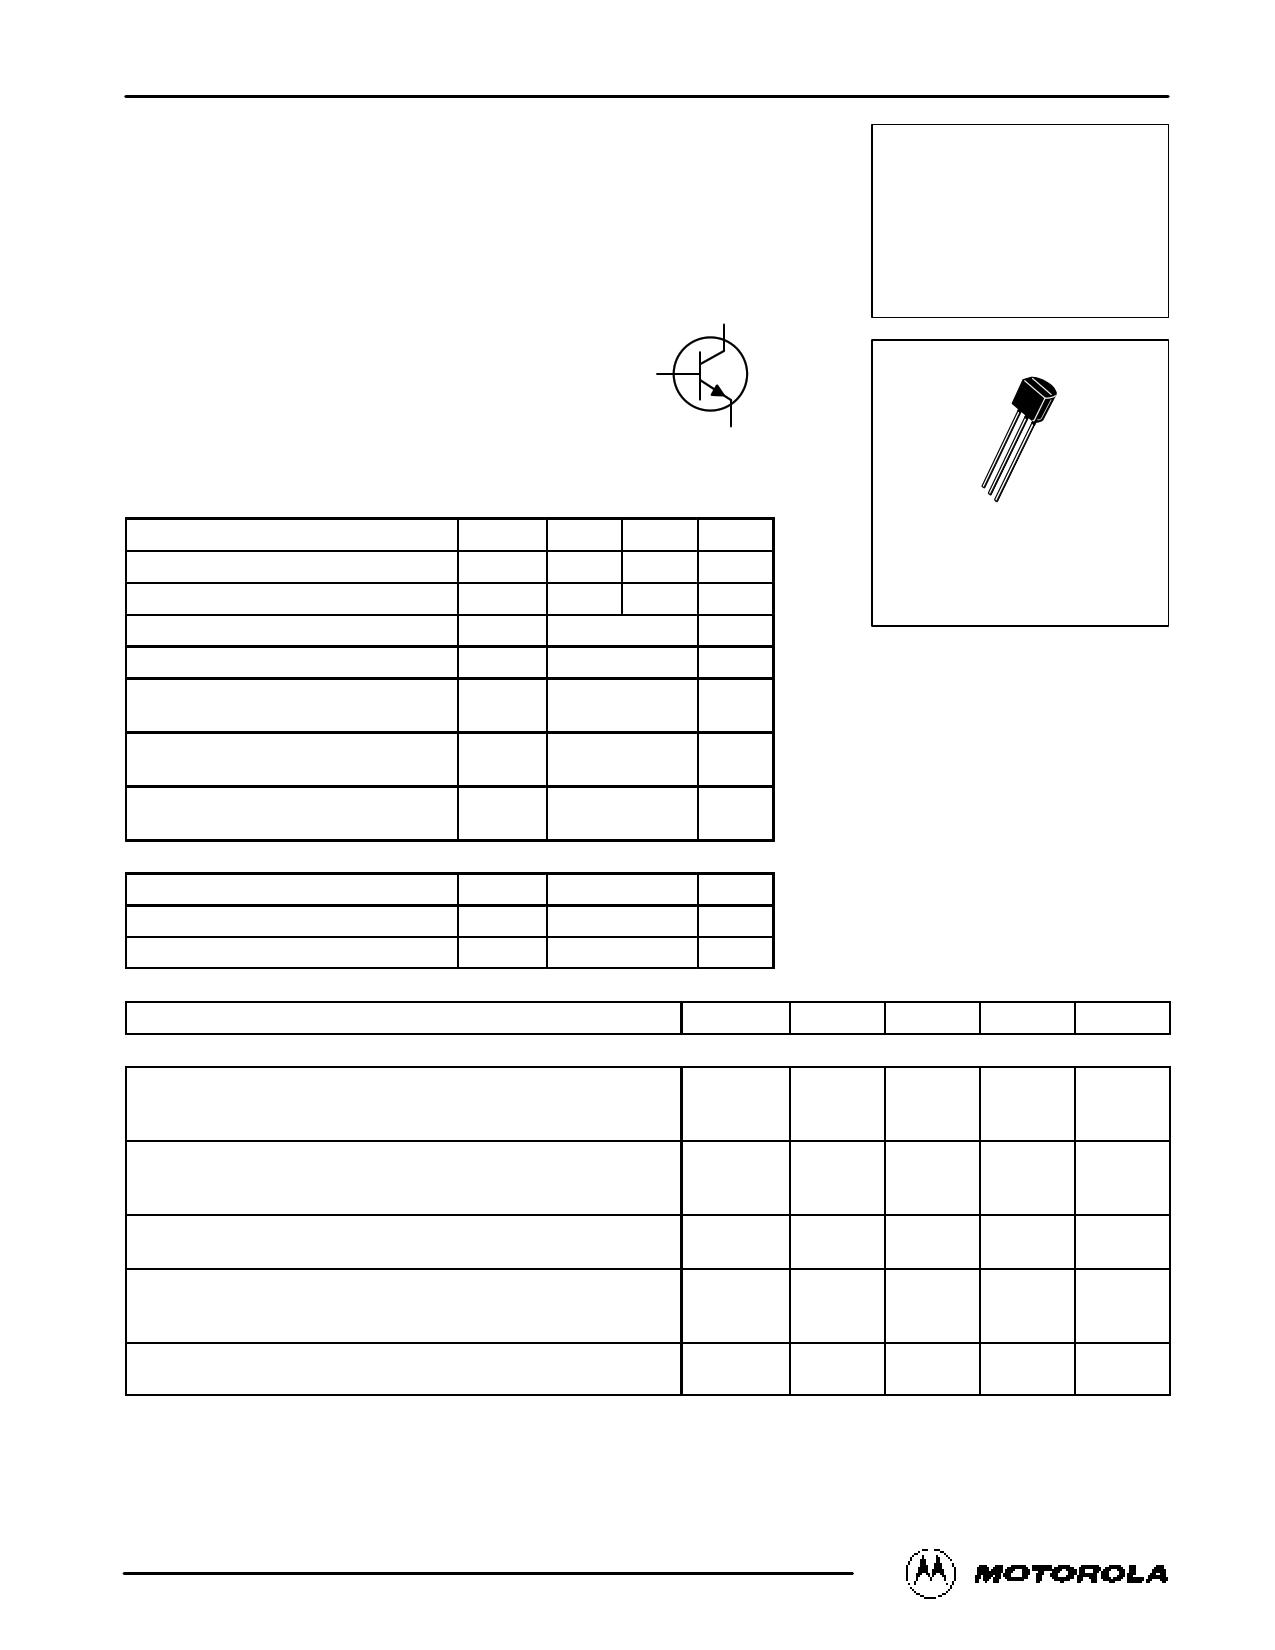 BC550C 데이터시트 및 BC550C PDF